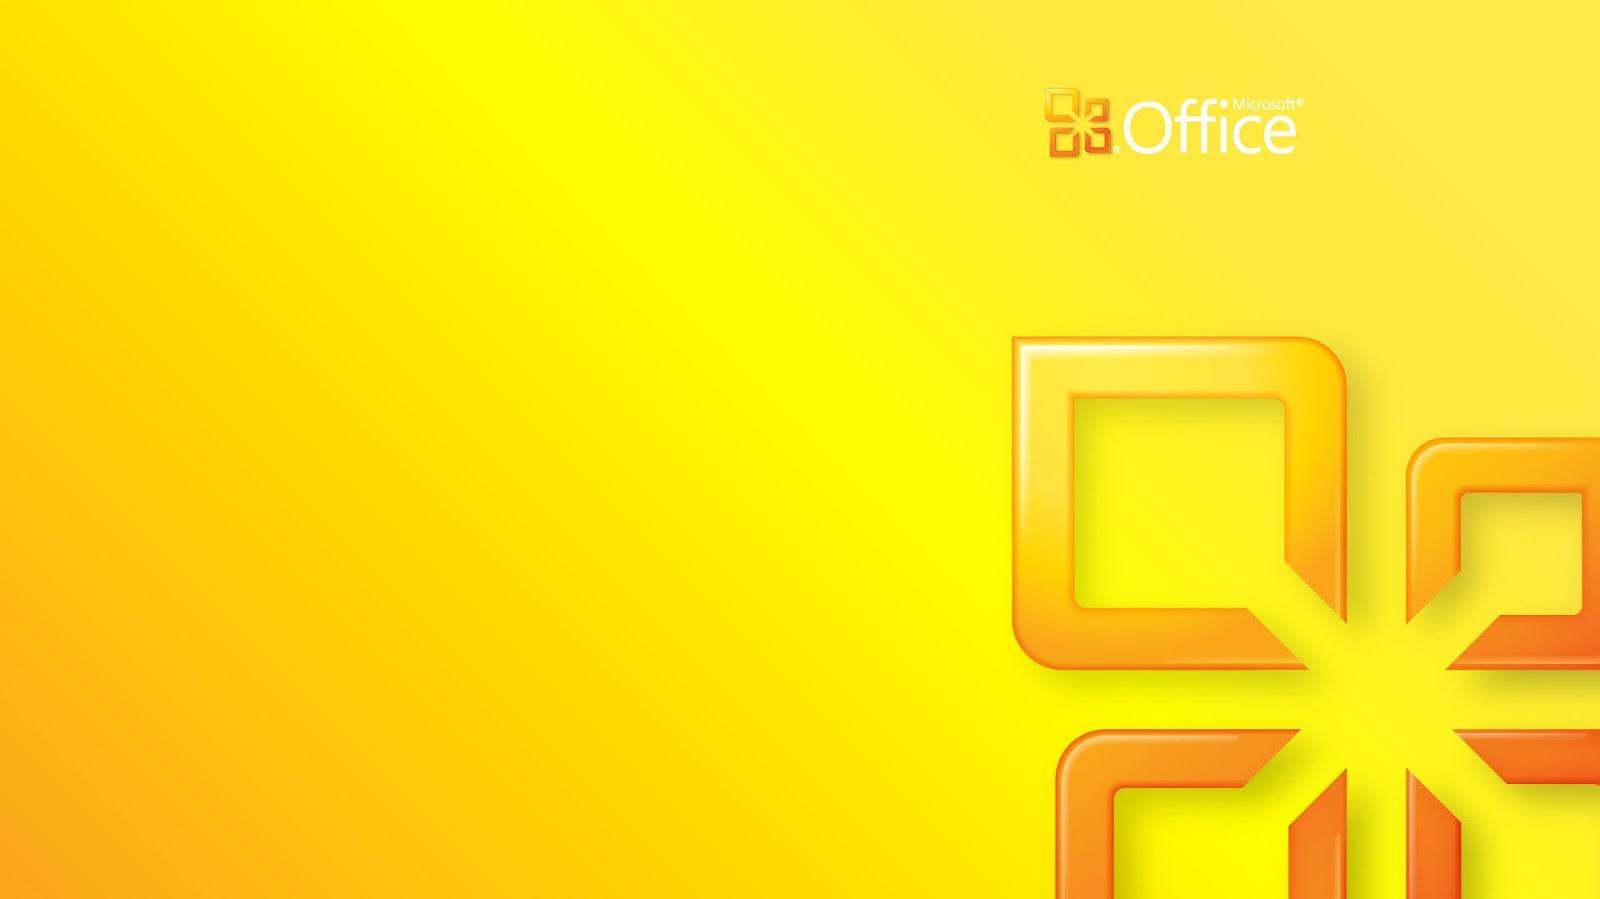 10 HD Microsoft Office 2010 Wallpaper Tam Super 1600x899